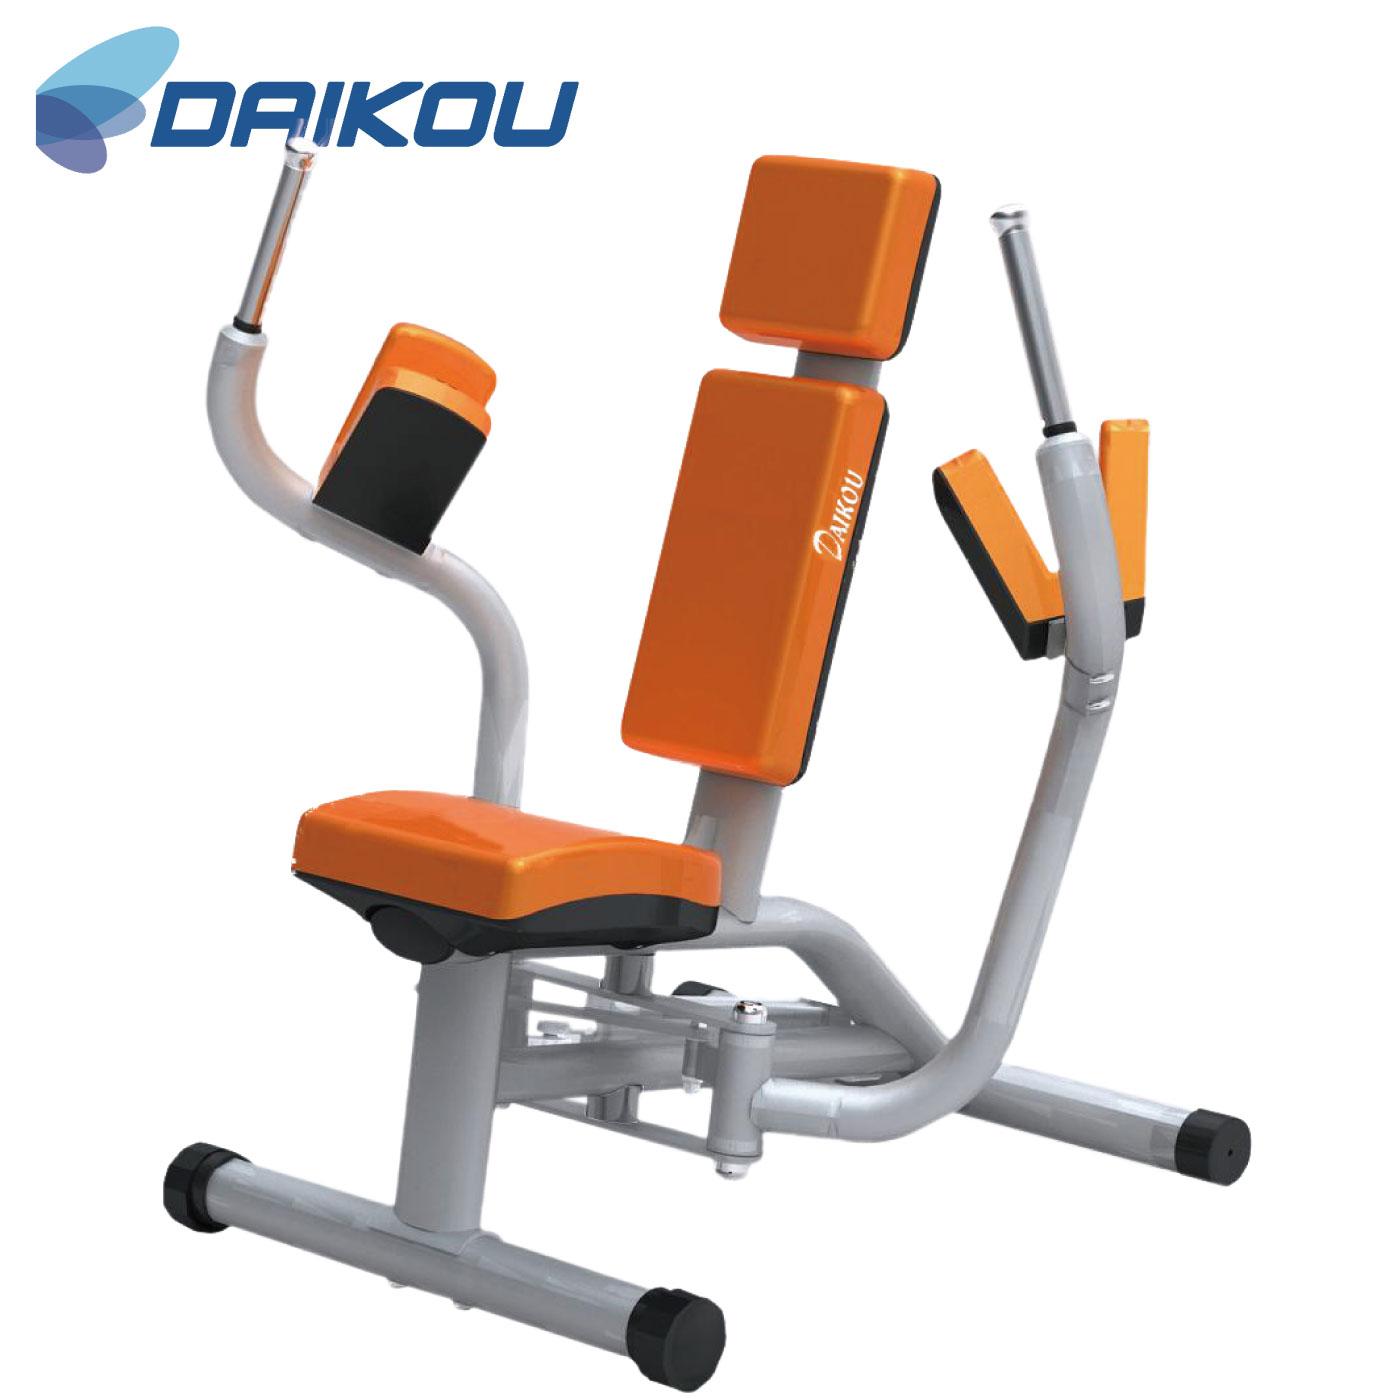 DK-1203(ペクトラルフライ・リアデルトイド)/準業務用油圧マシン《DAIKOU(ダイコー)》